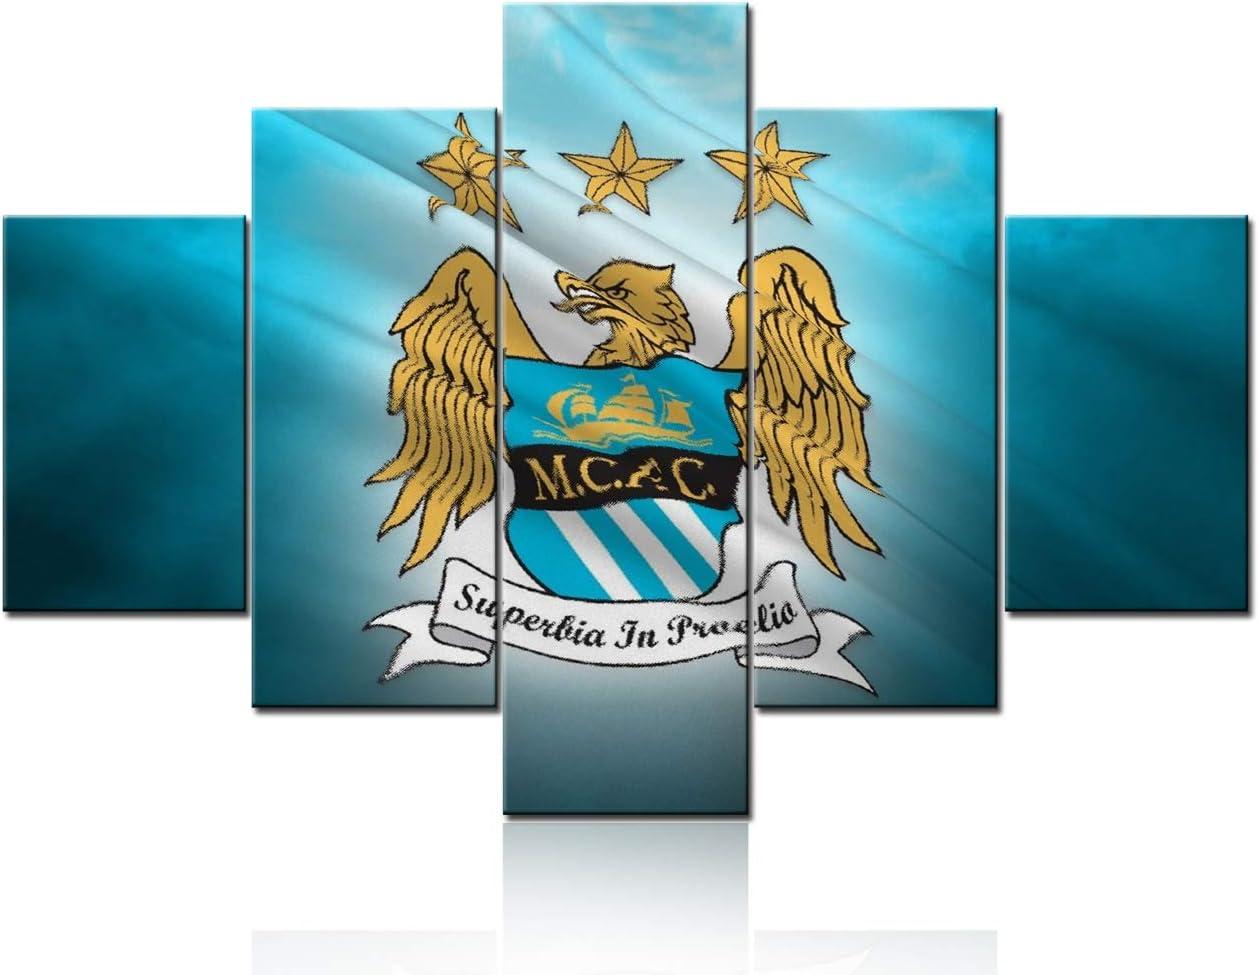 5 Piece Canvas Wall Art of Manchester City FC Football Club